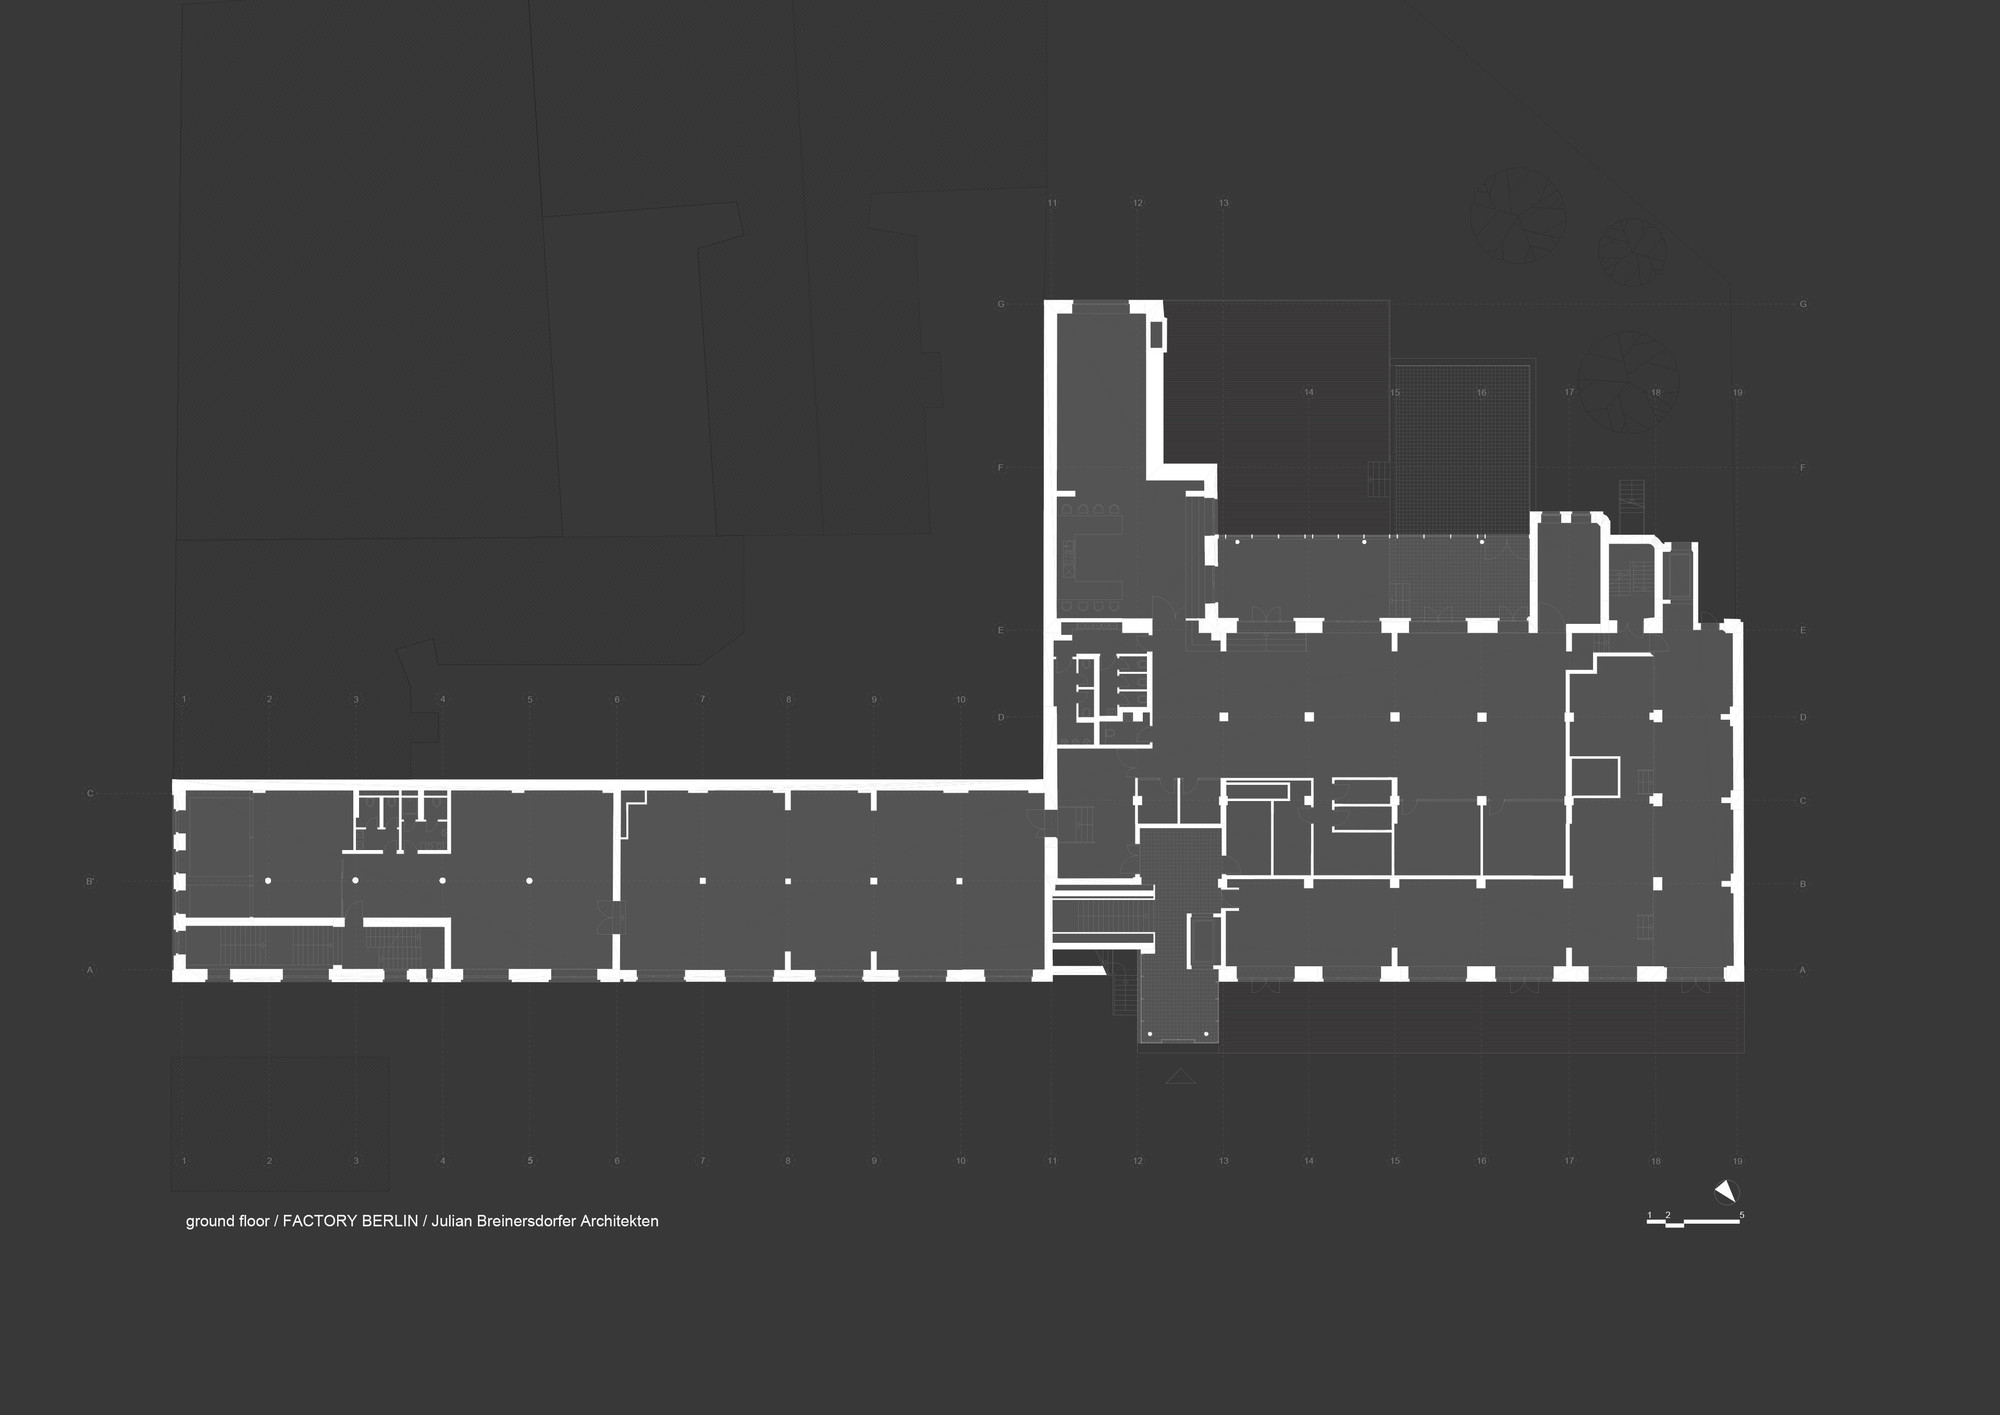 Gallery Of The Factory Berlin Julian Breinersdorfer Architecture 9